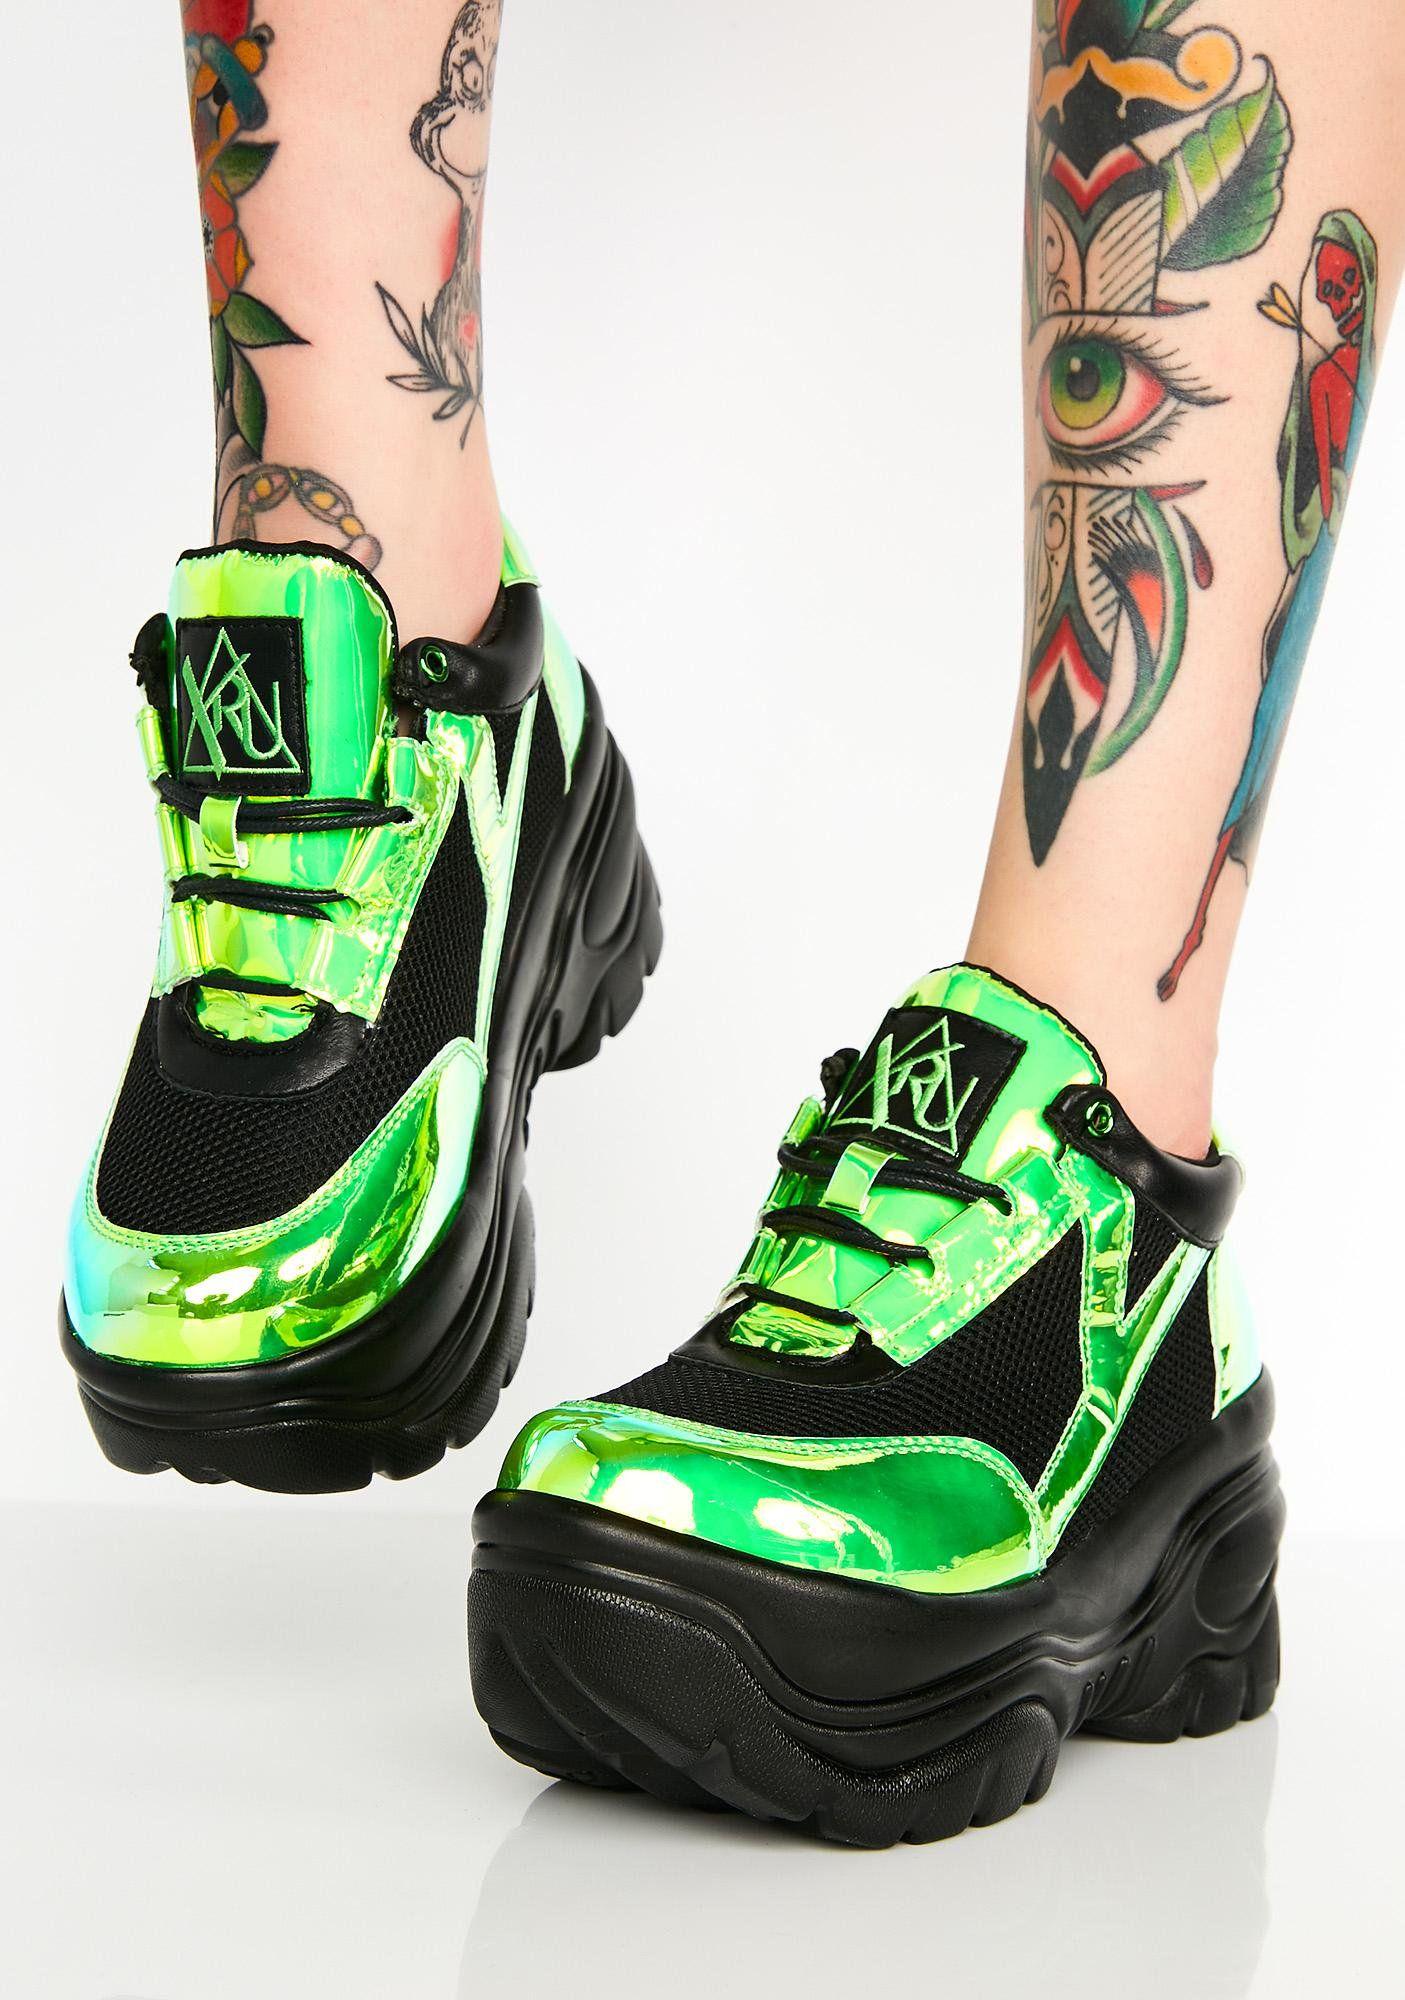 bdf25ce63d3c Kush Matrixx Platform Sneakers